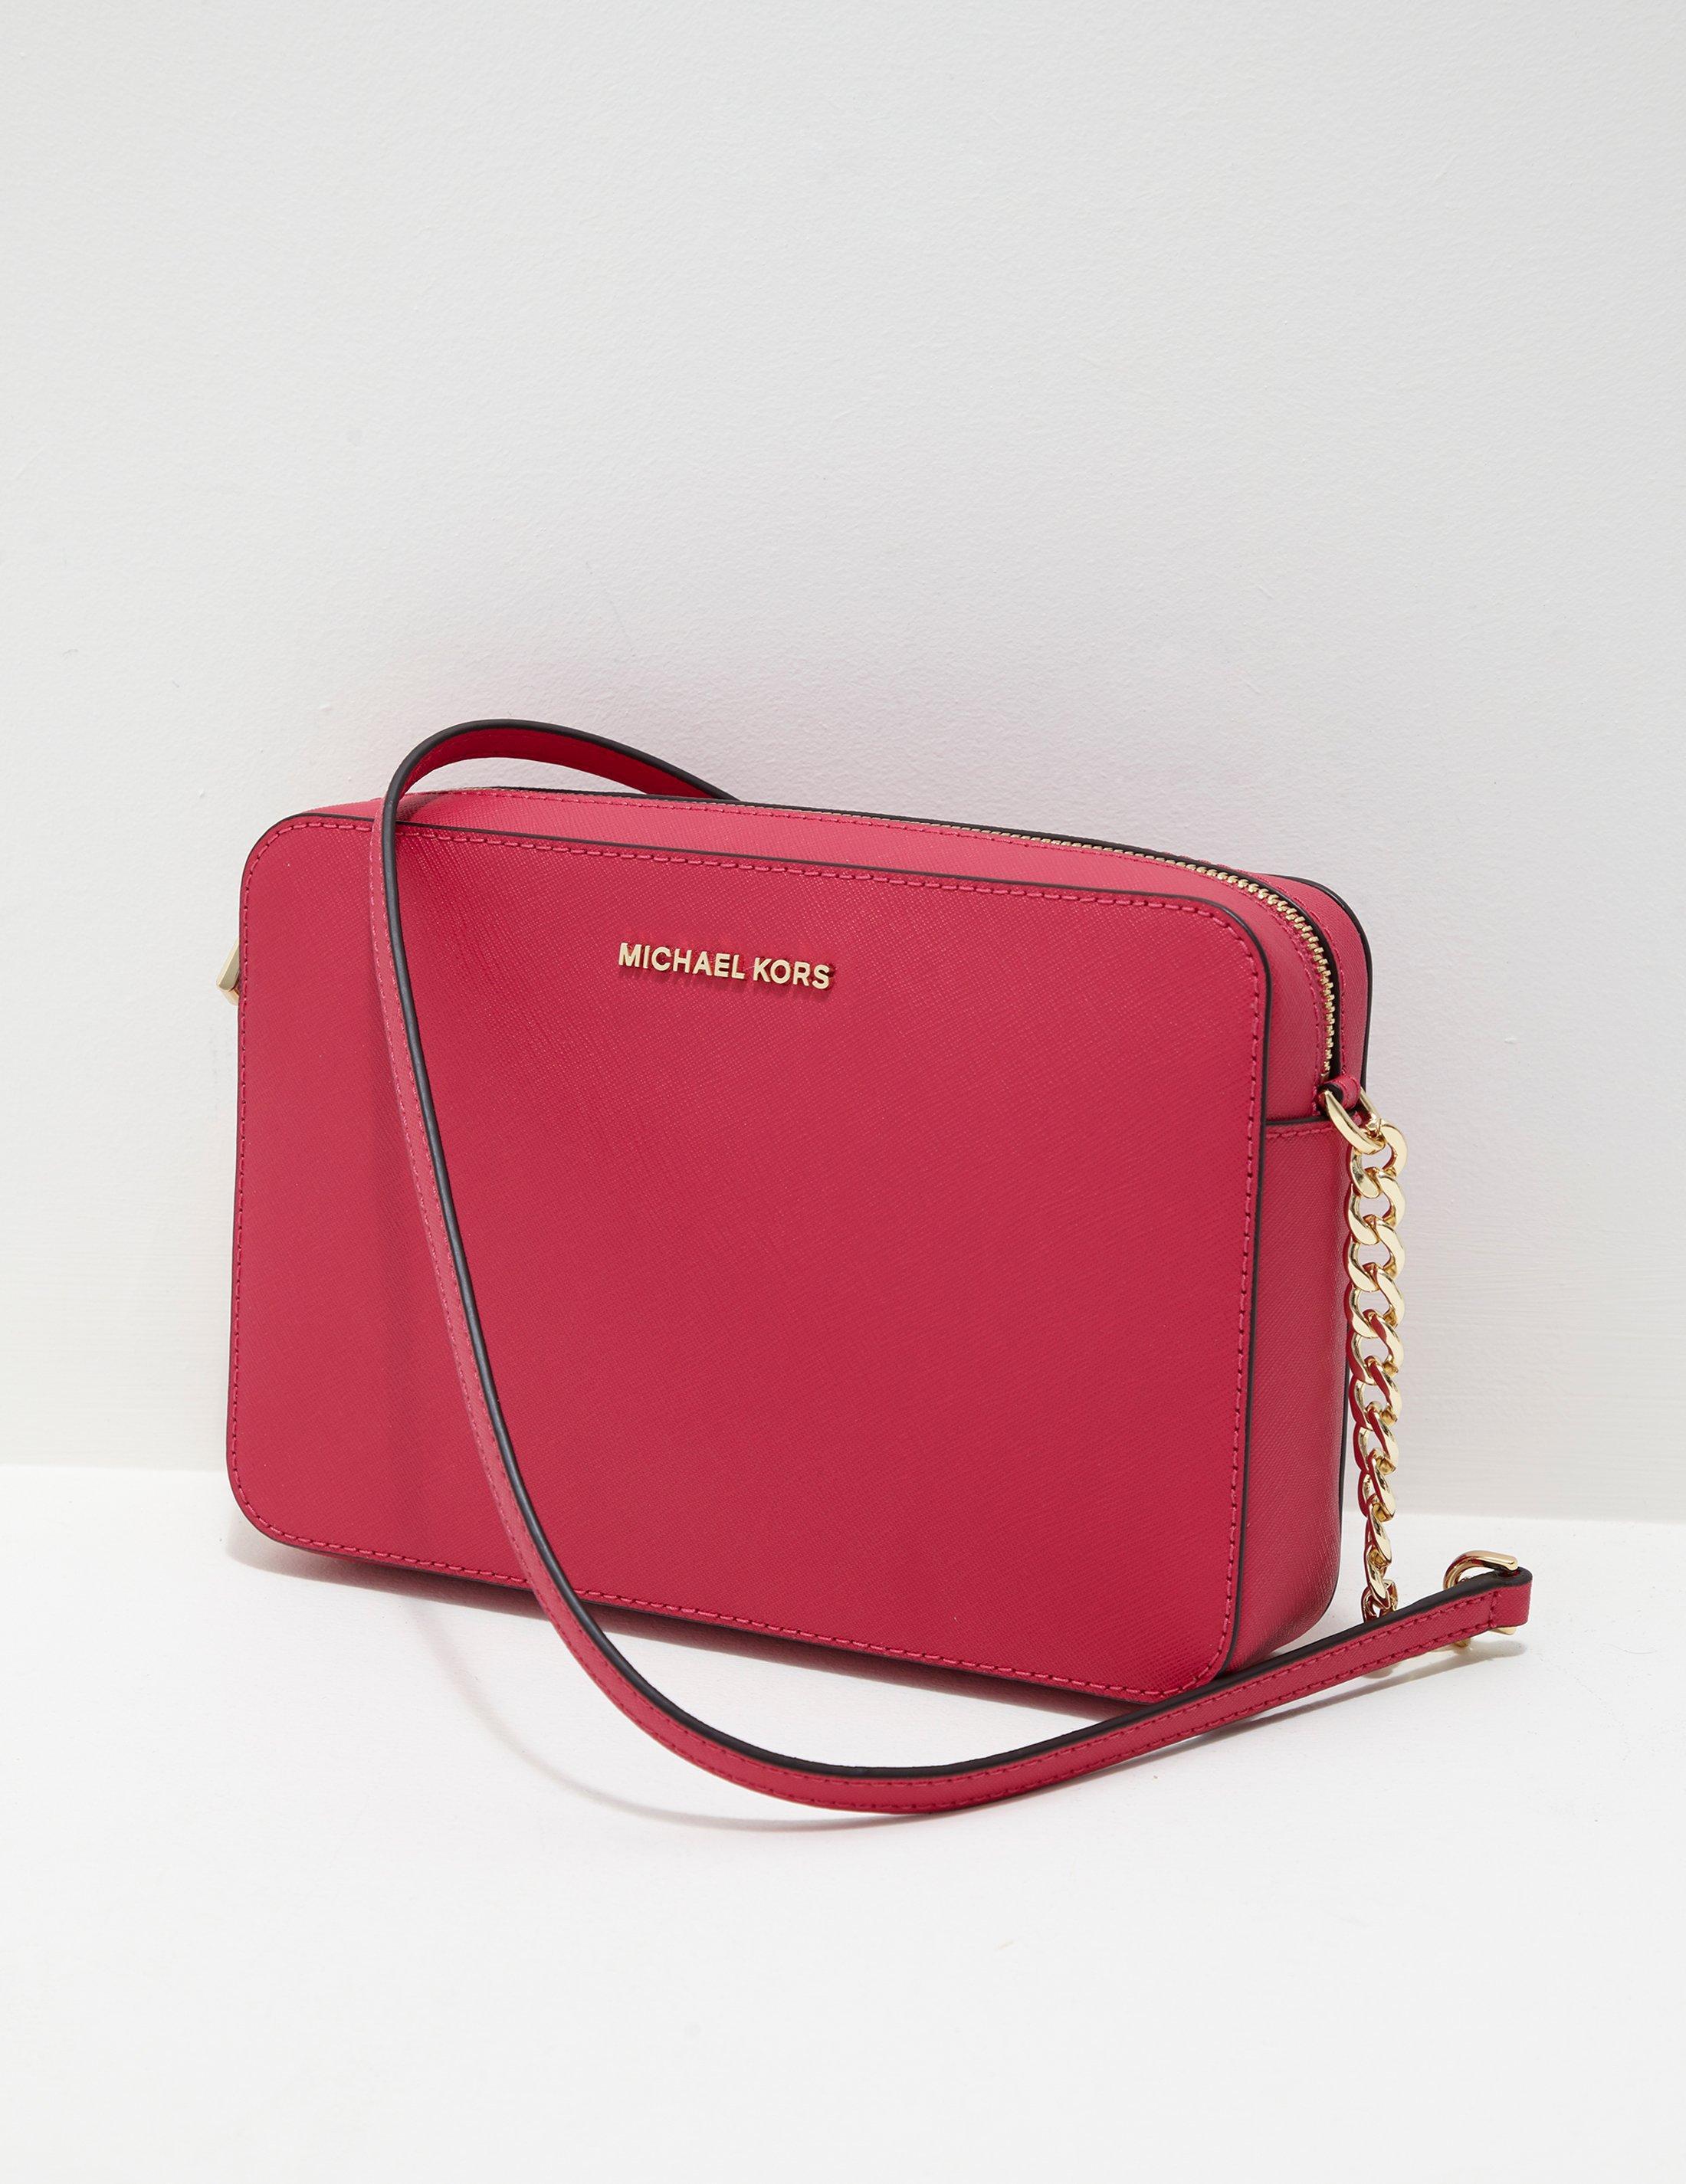 Michael Kors Womens Large East West Shoulder Bag Pink in Pink - Lyst f69f723df80f0